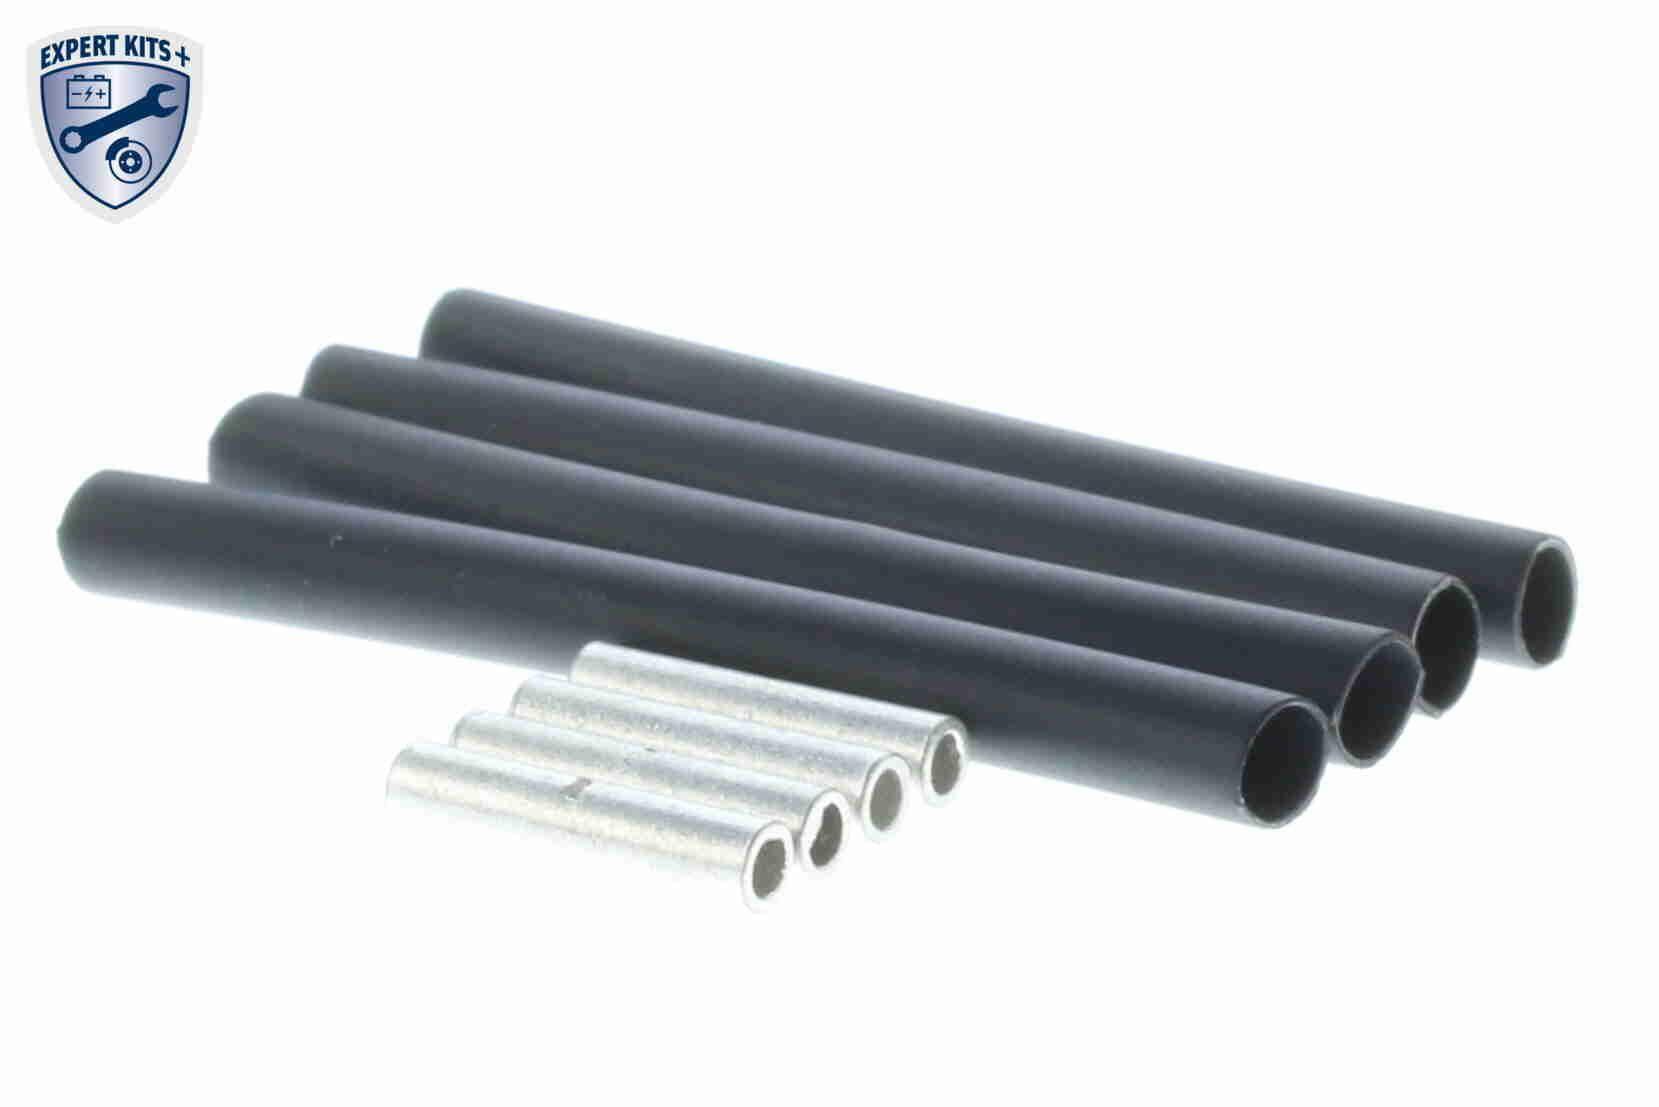 V99-76-0002 O2 Sensor VEMO - Cheap brand products